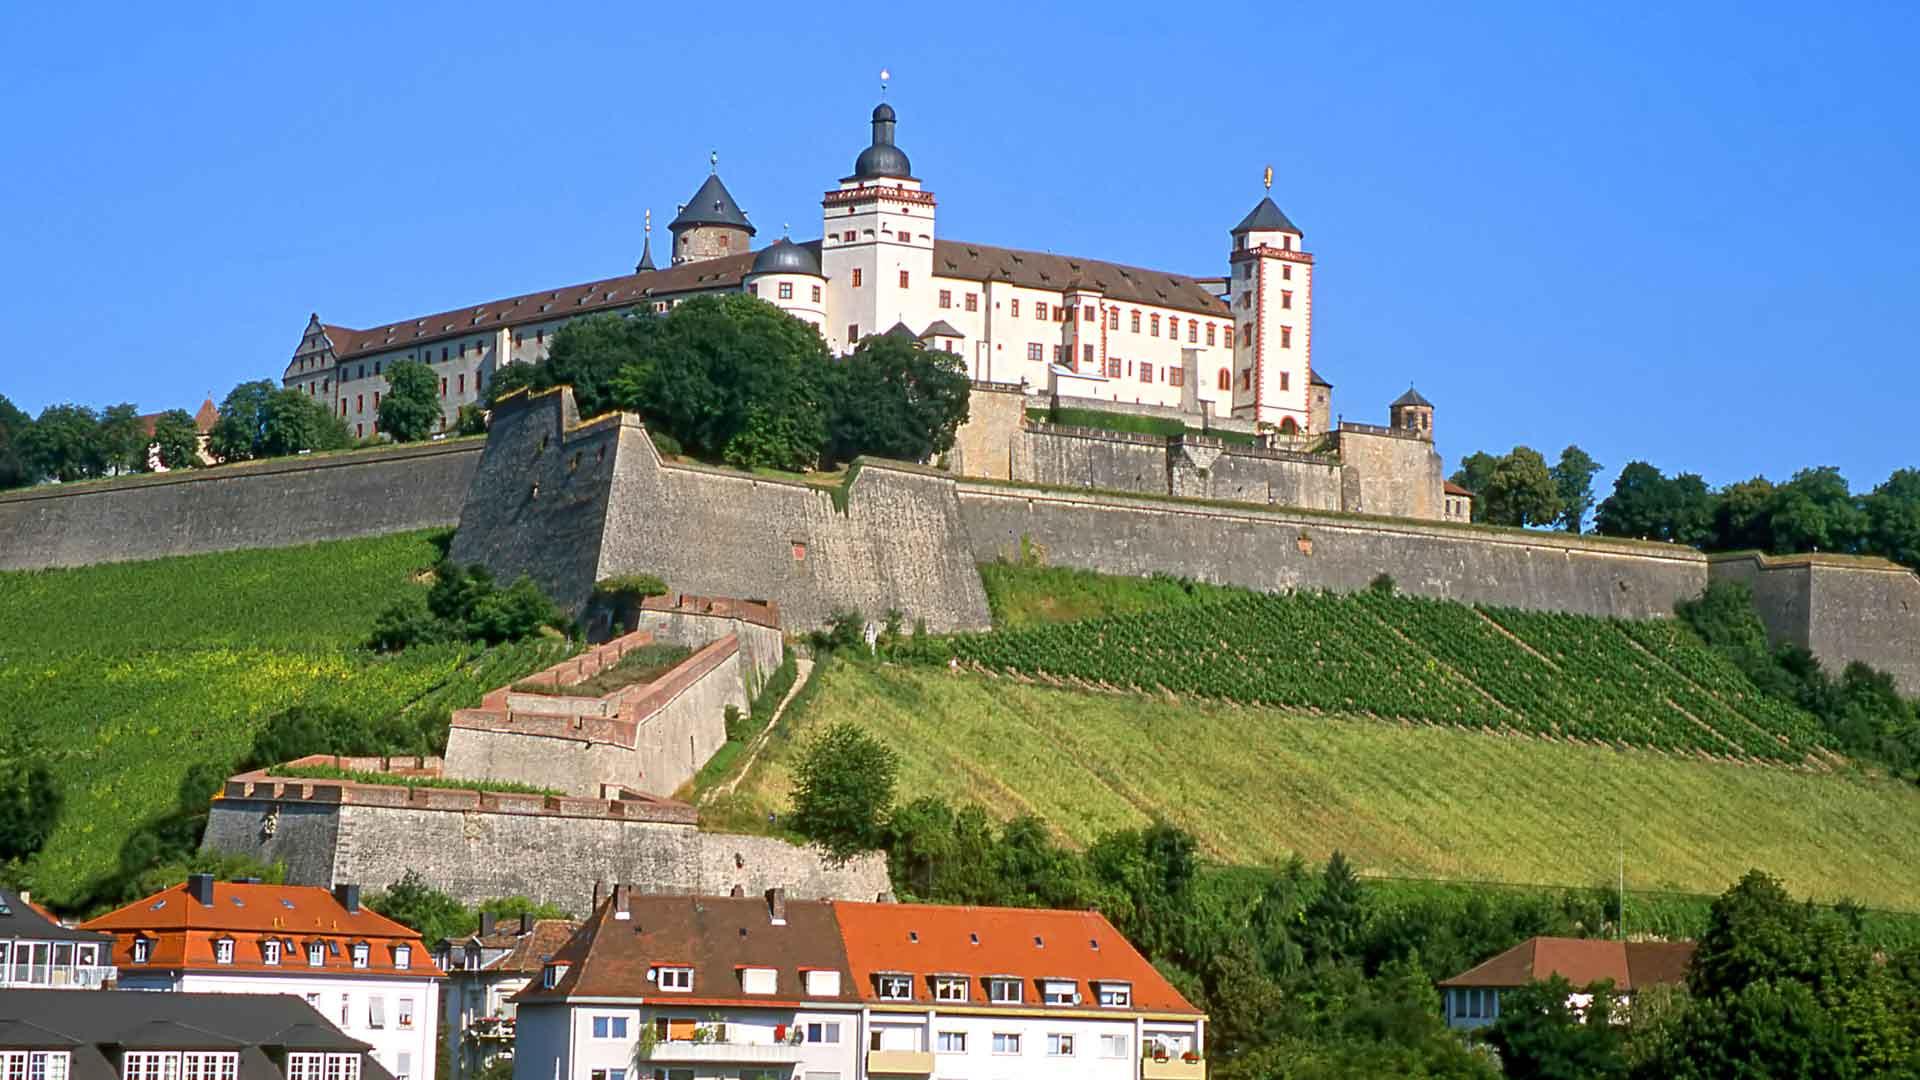 De Marienvesting in Würzburg